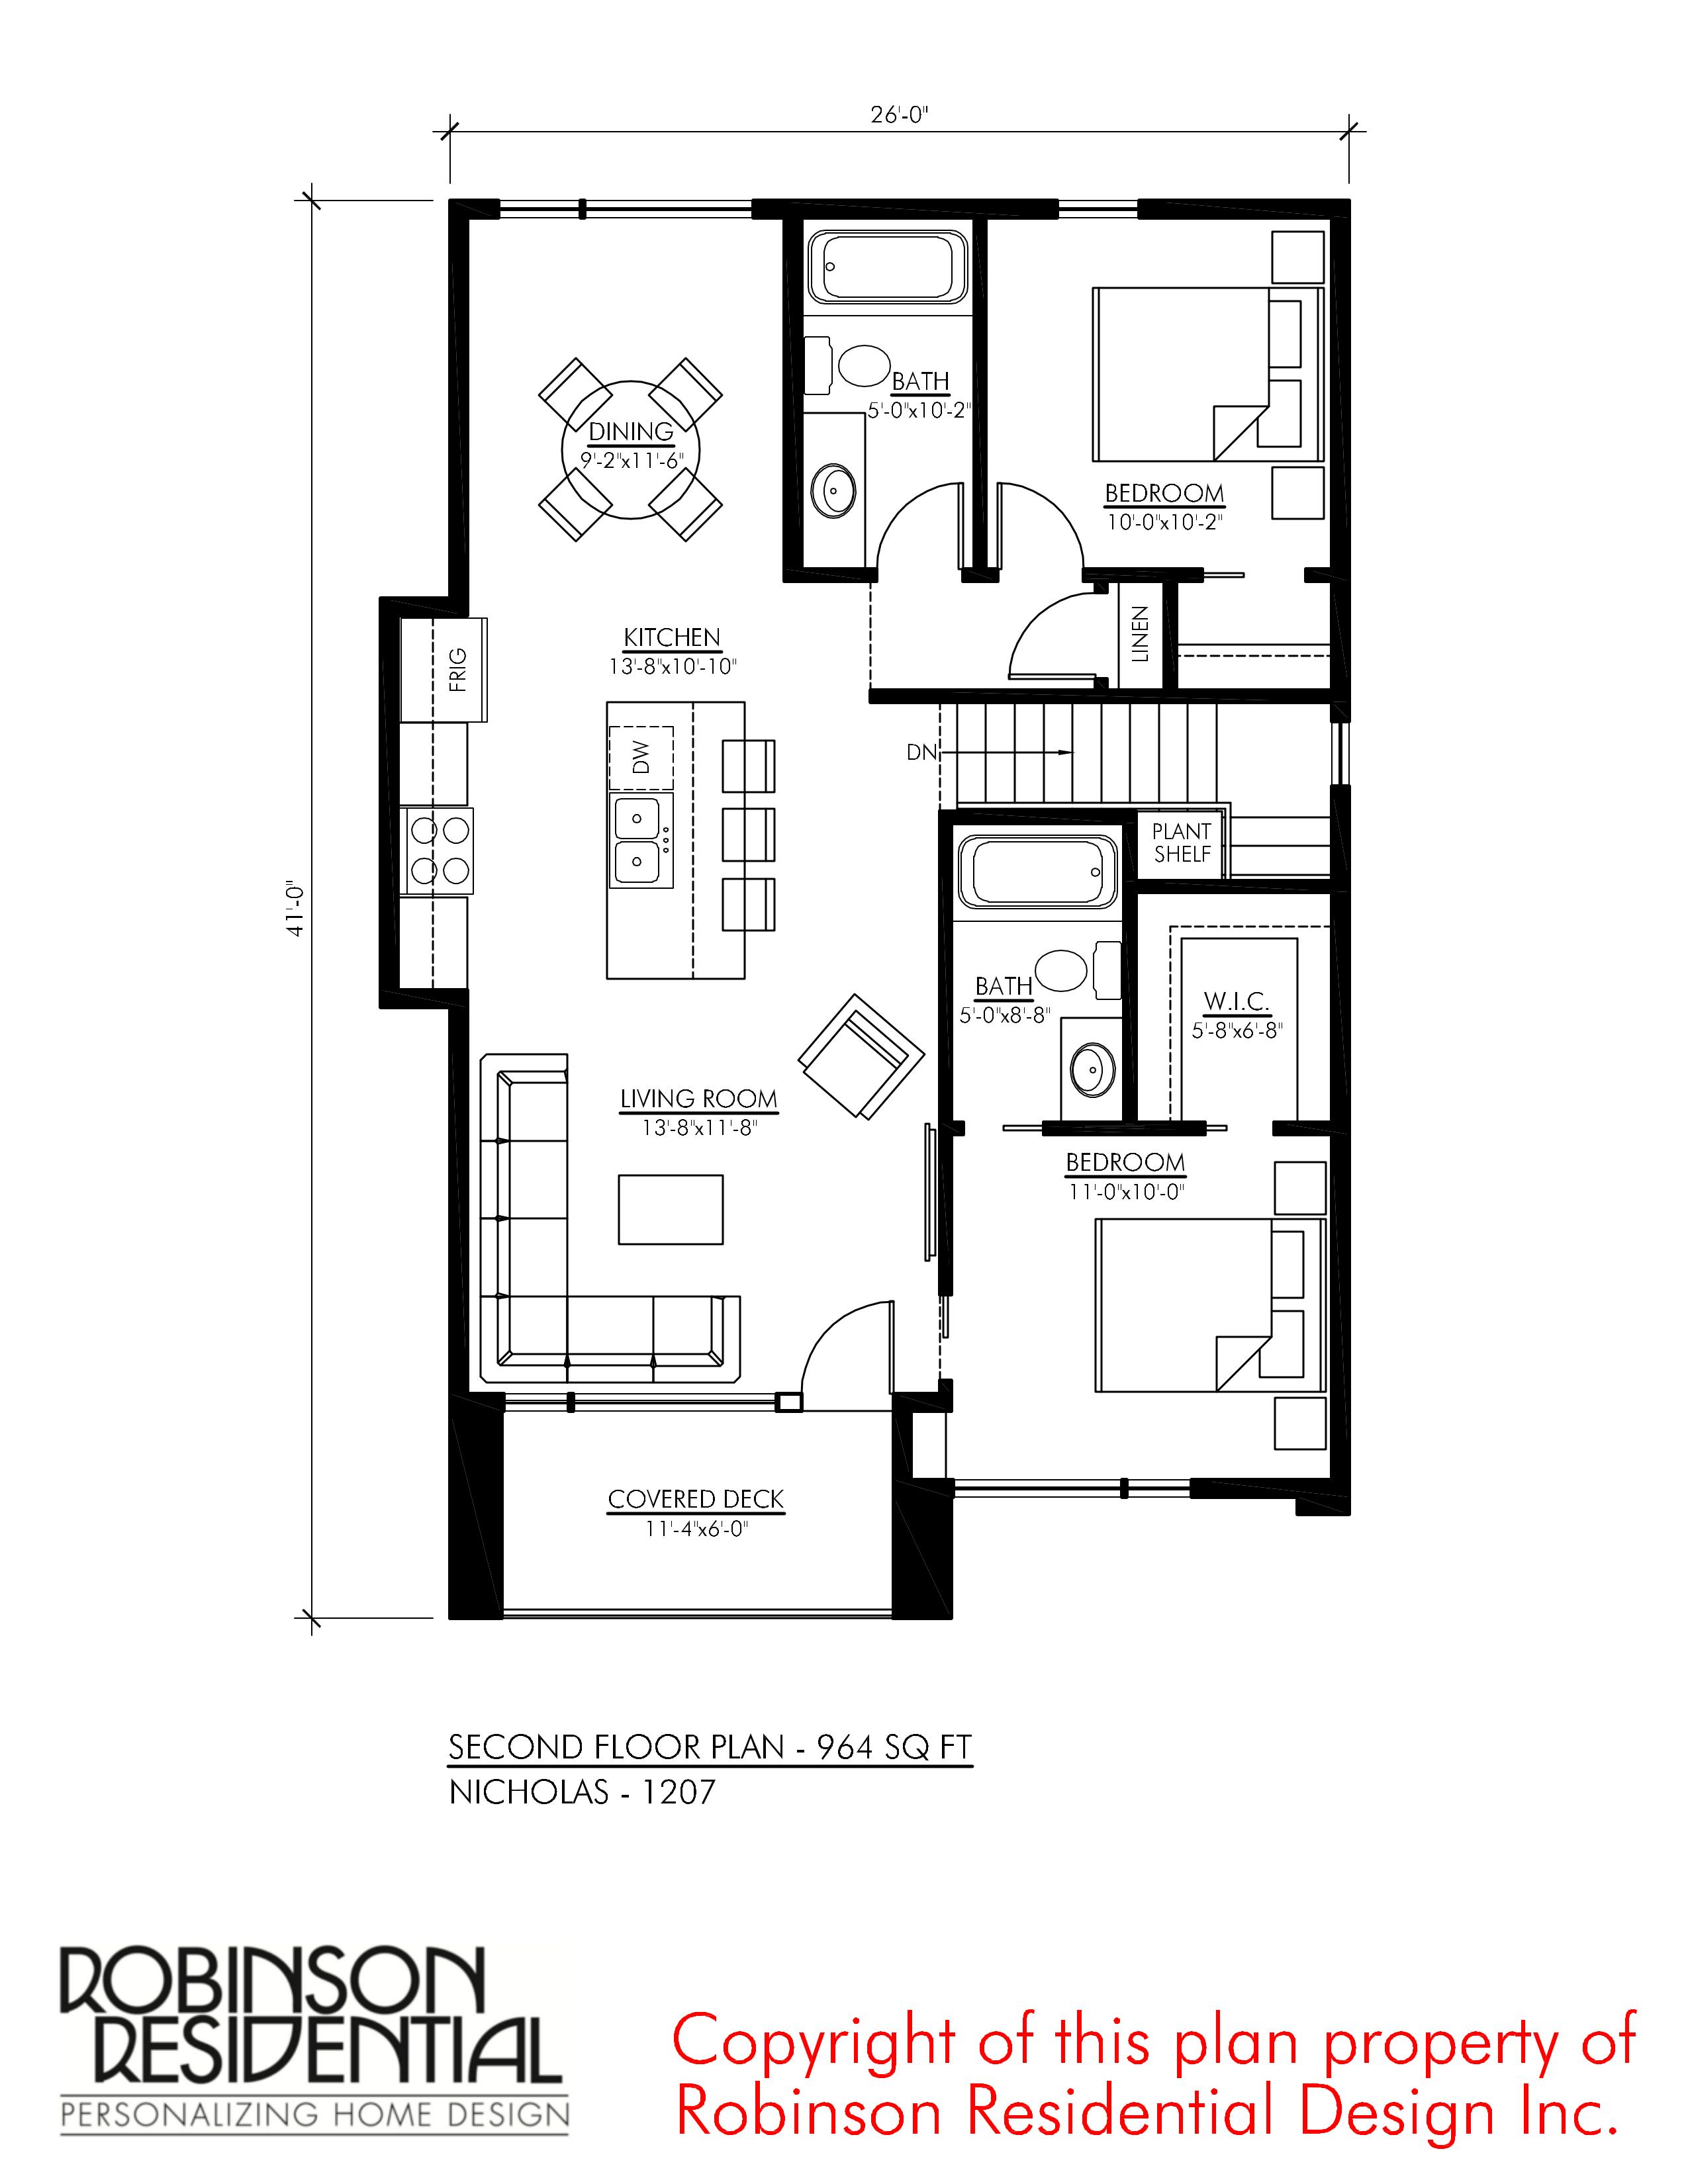 Contemporary Nicholas 1207 Robinson Plans